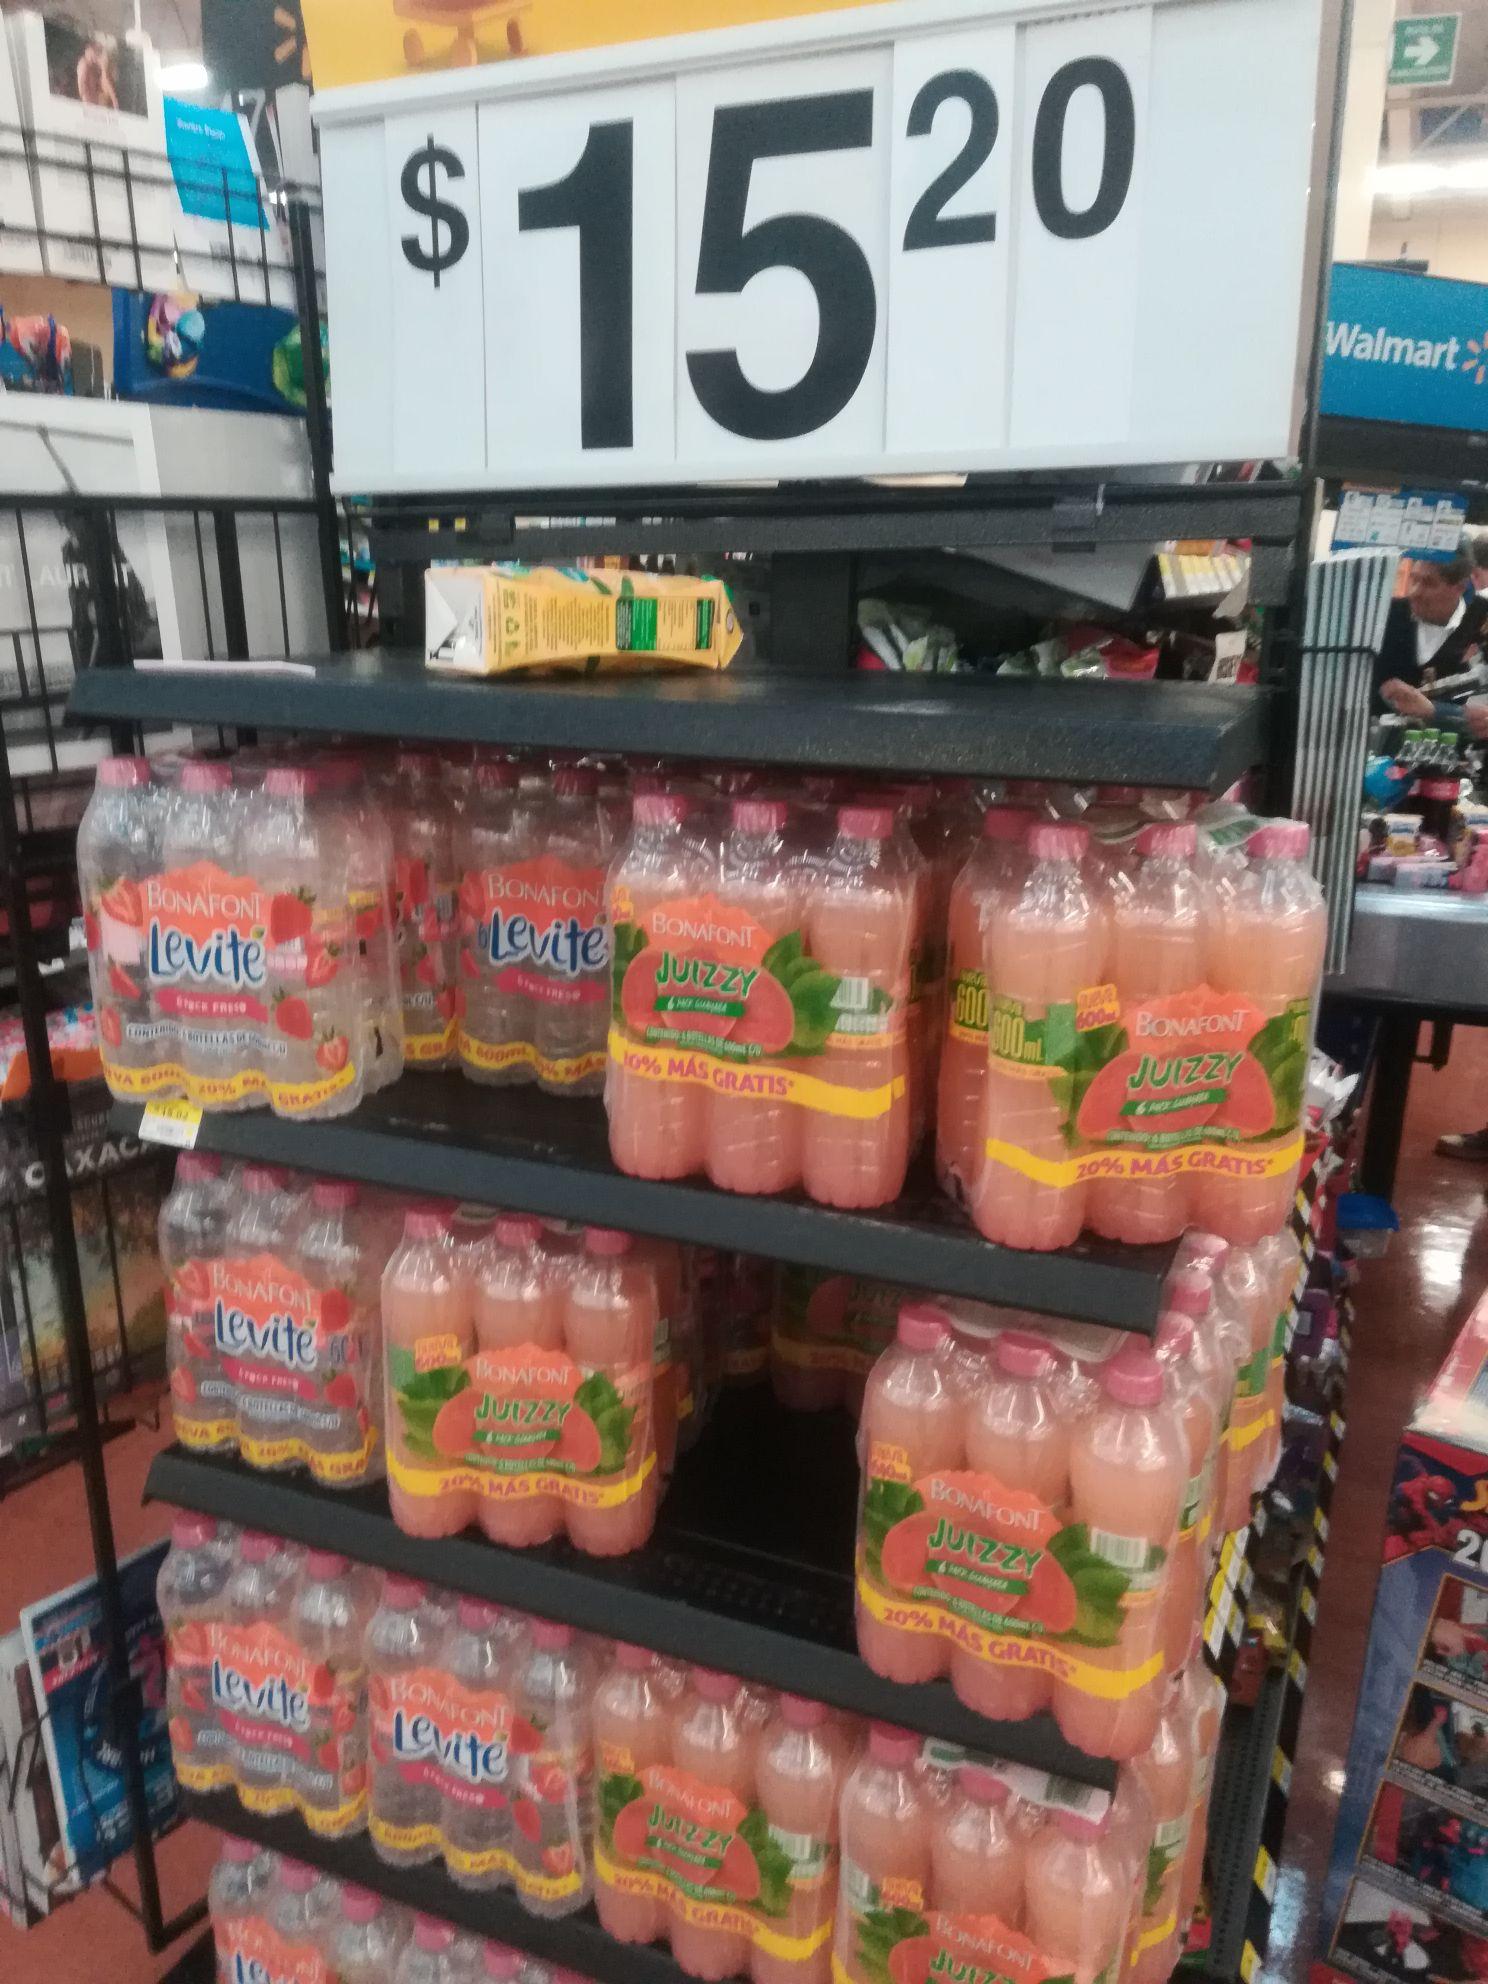 Walmart Cuitlahuac : 6 botellas de agua